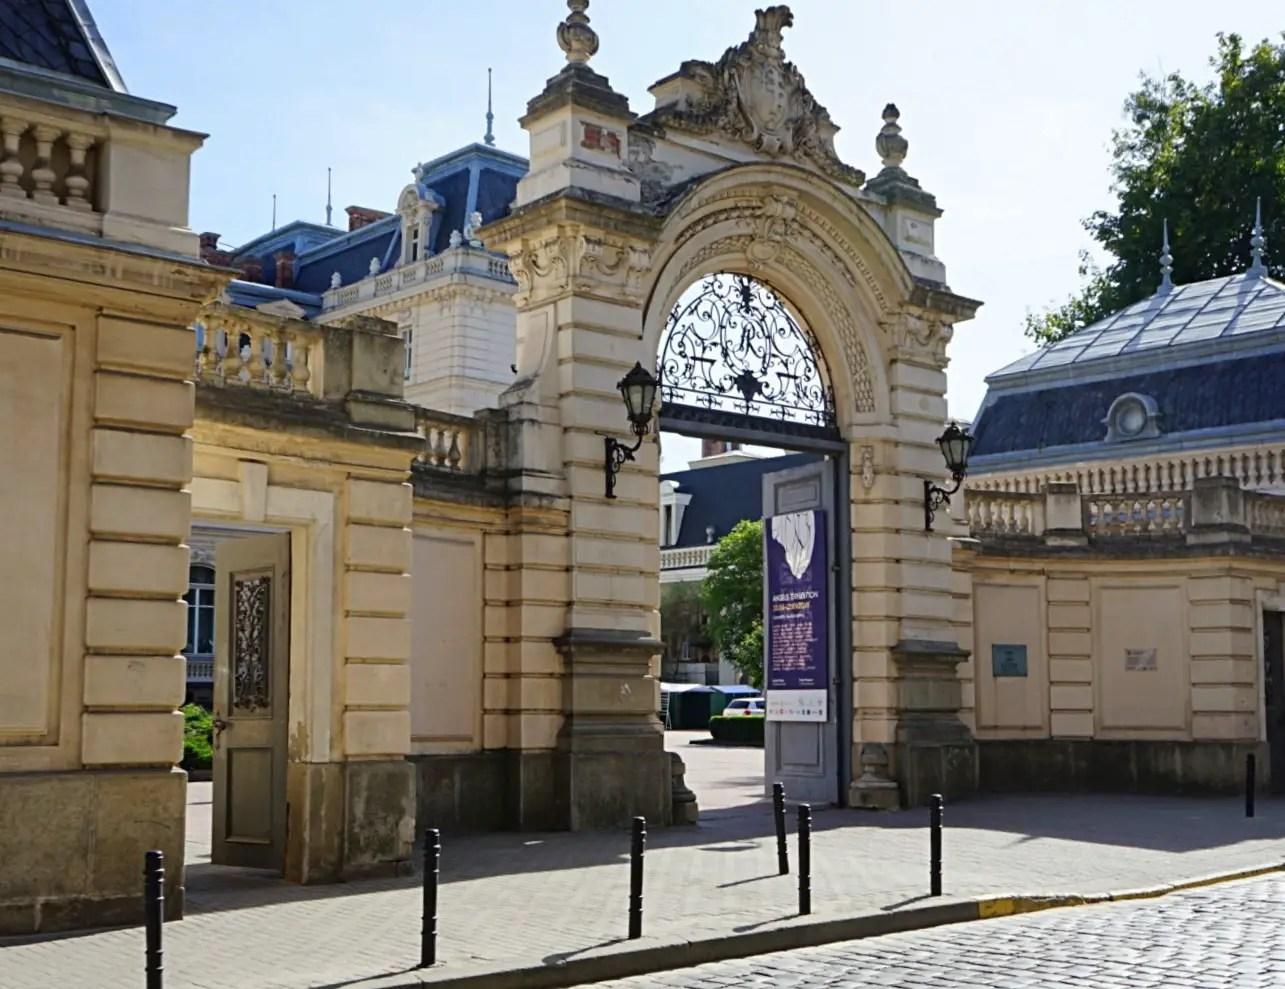 The entrance to Potocki palace